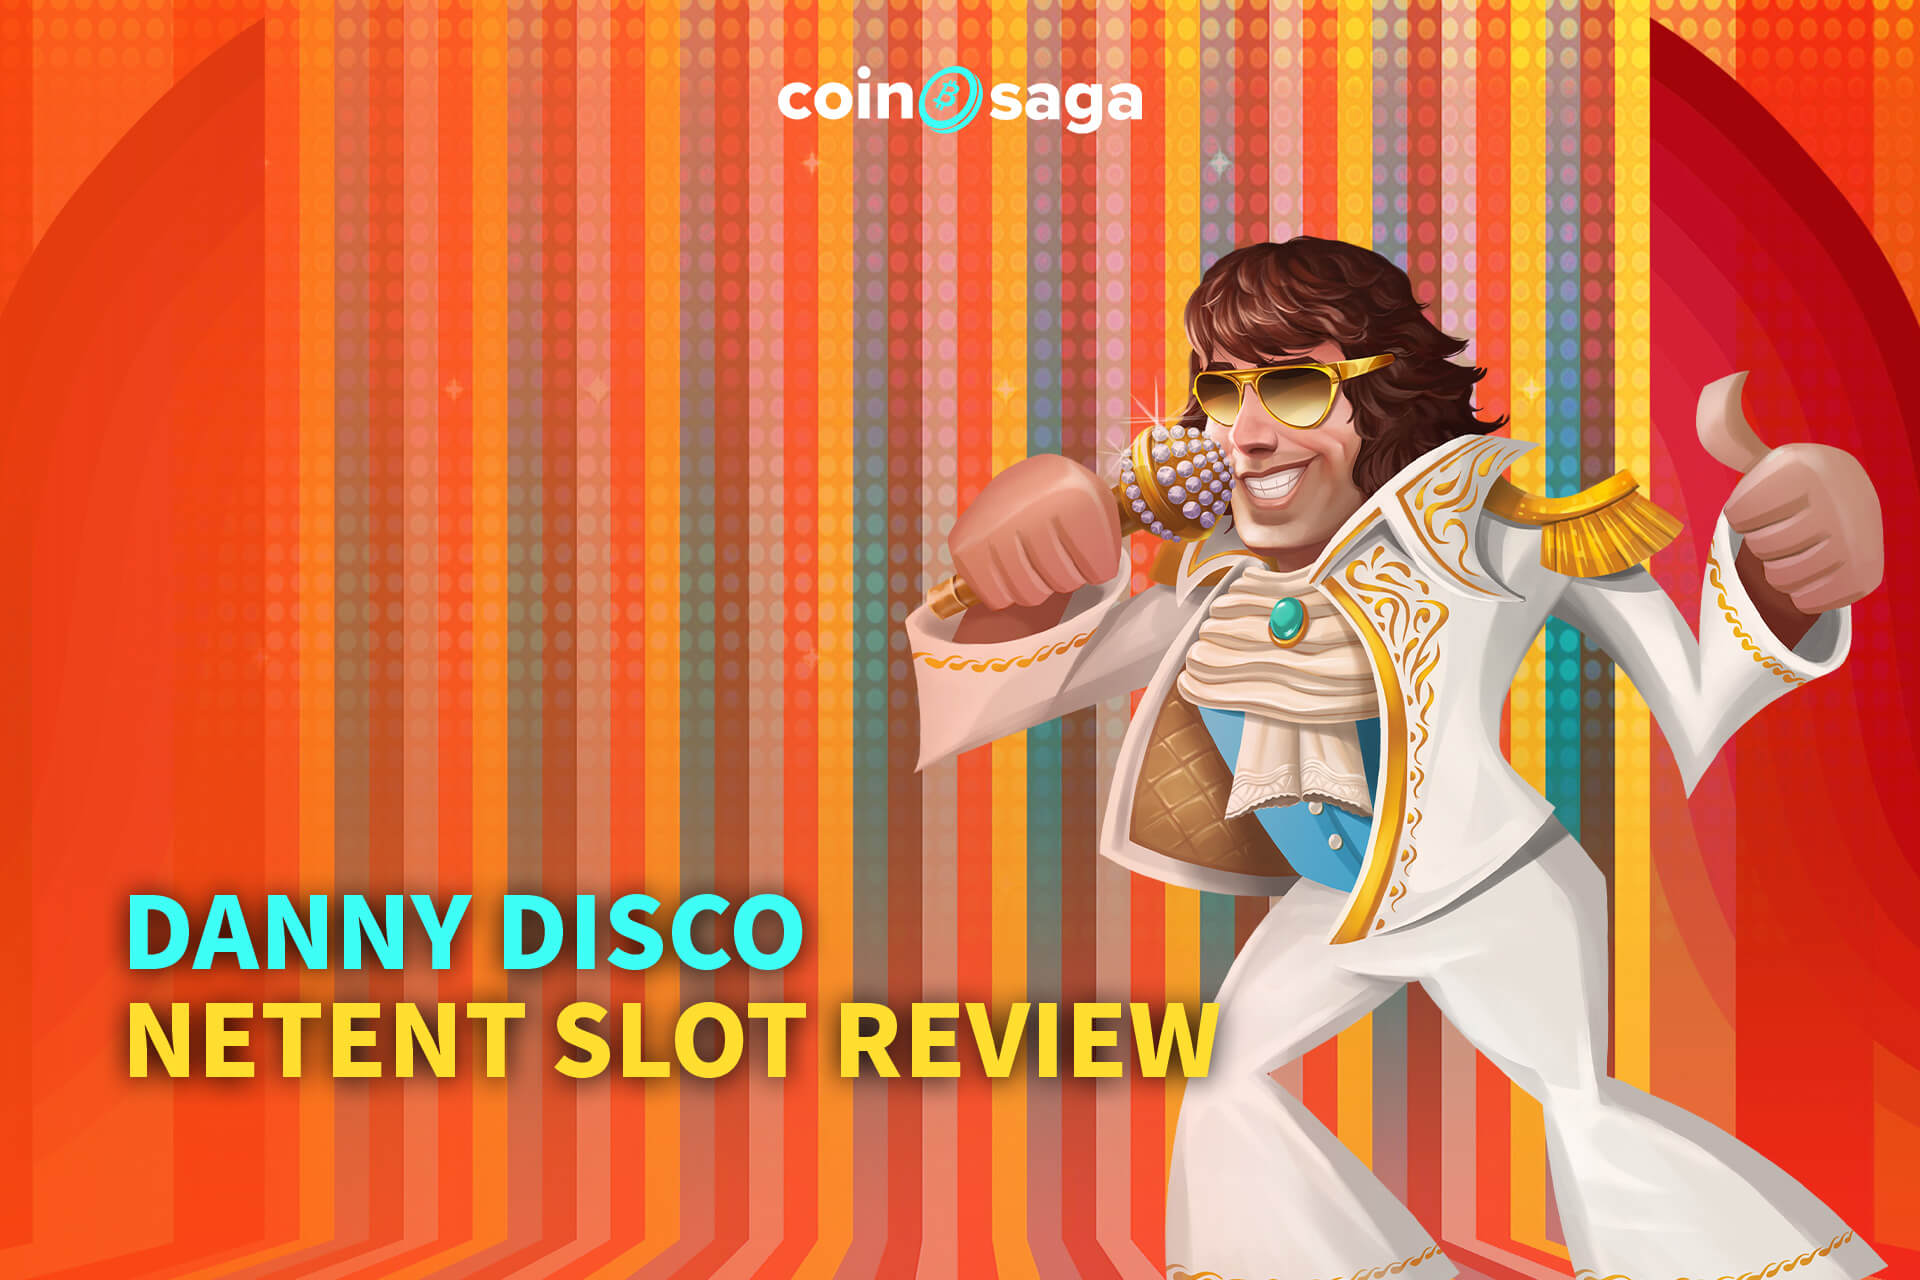 Disco Danny slot review